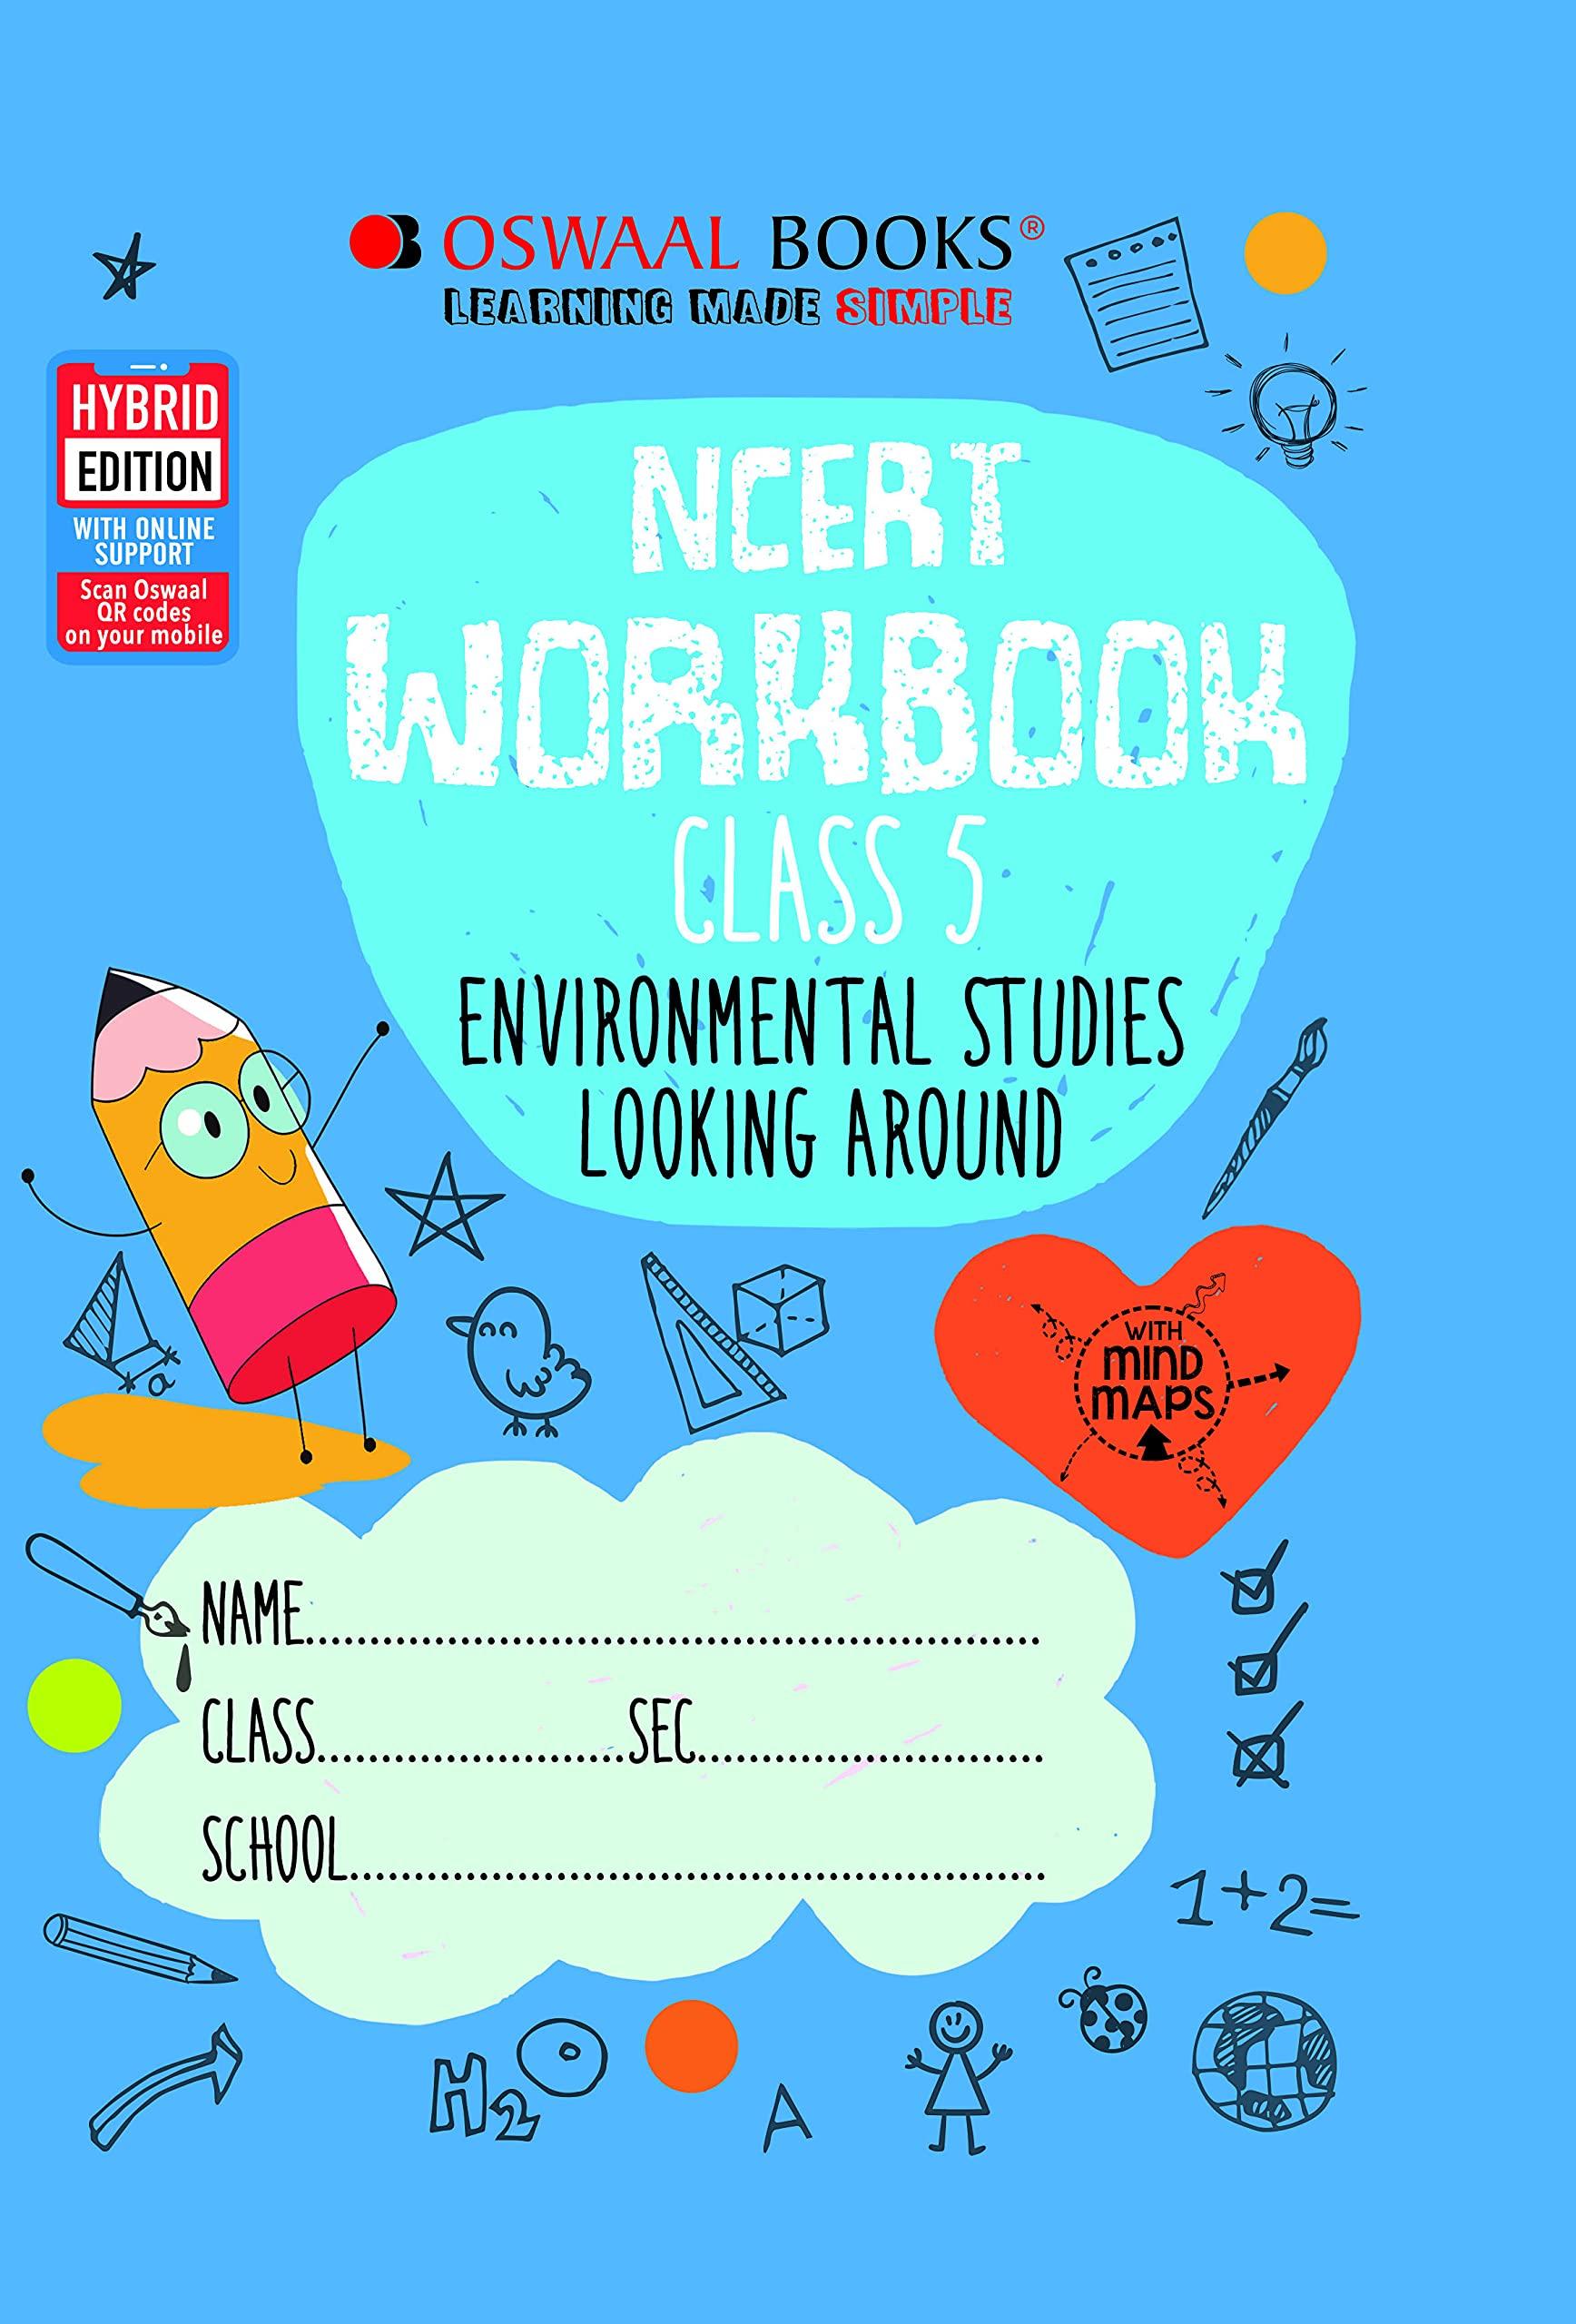 Oswaal NCERT Workbook Class 5, Environmental Studies (For 2022 Exam)